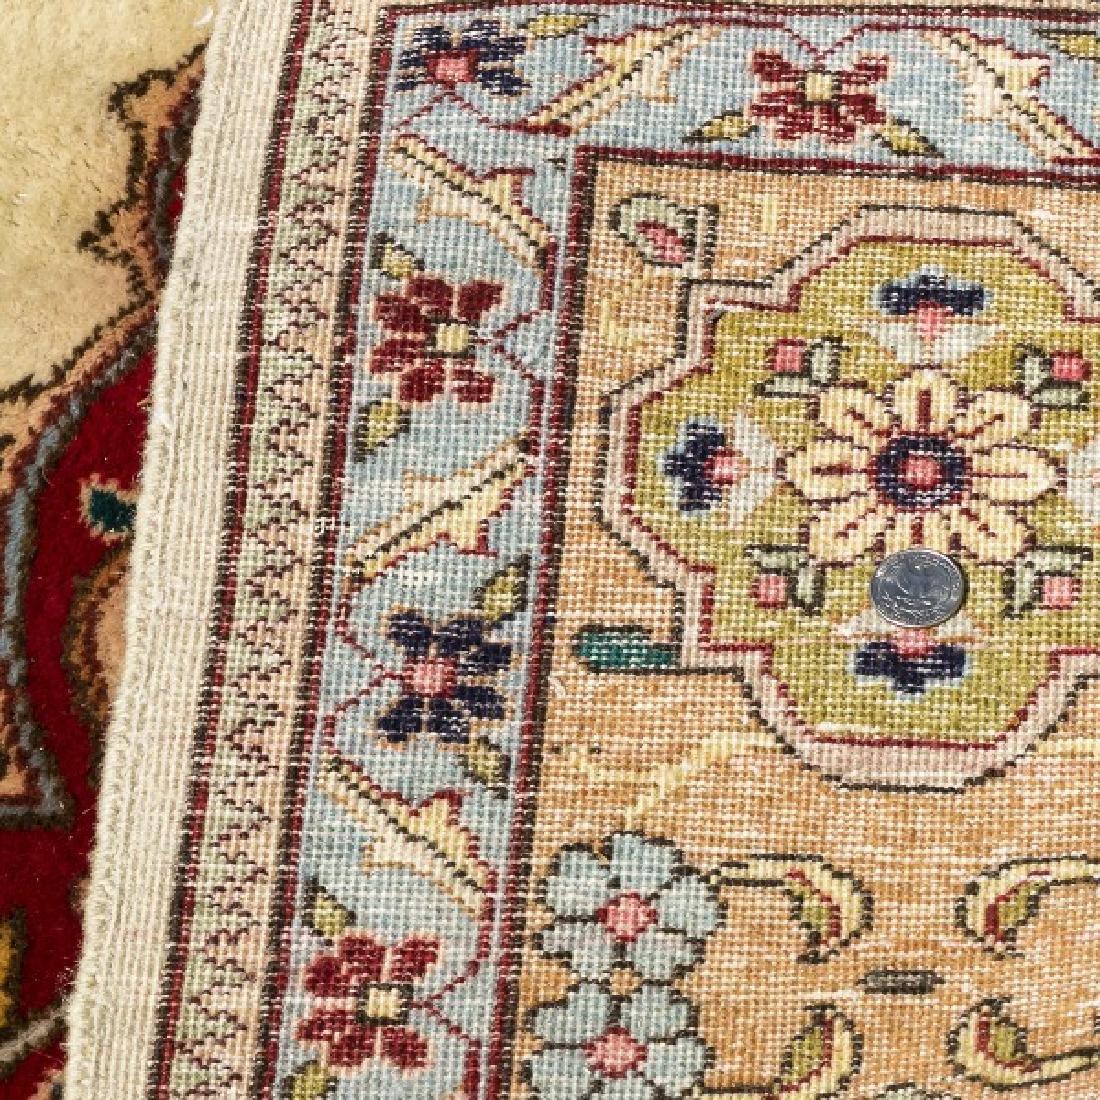 "Hand Woven Tabriz Rug, 11' 7"" x  8' 7"" - 2"